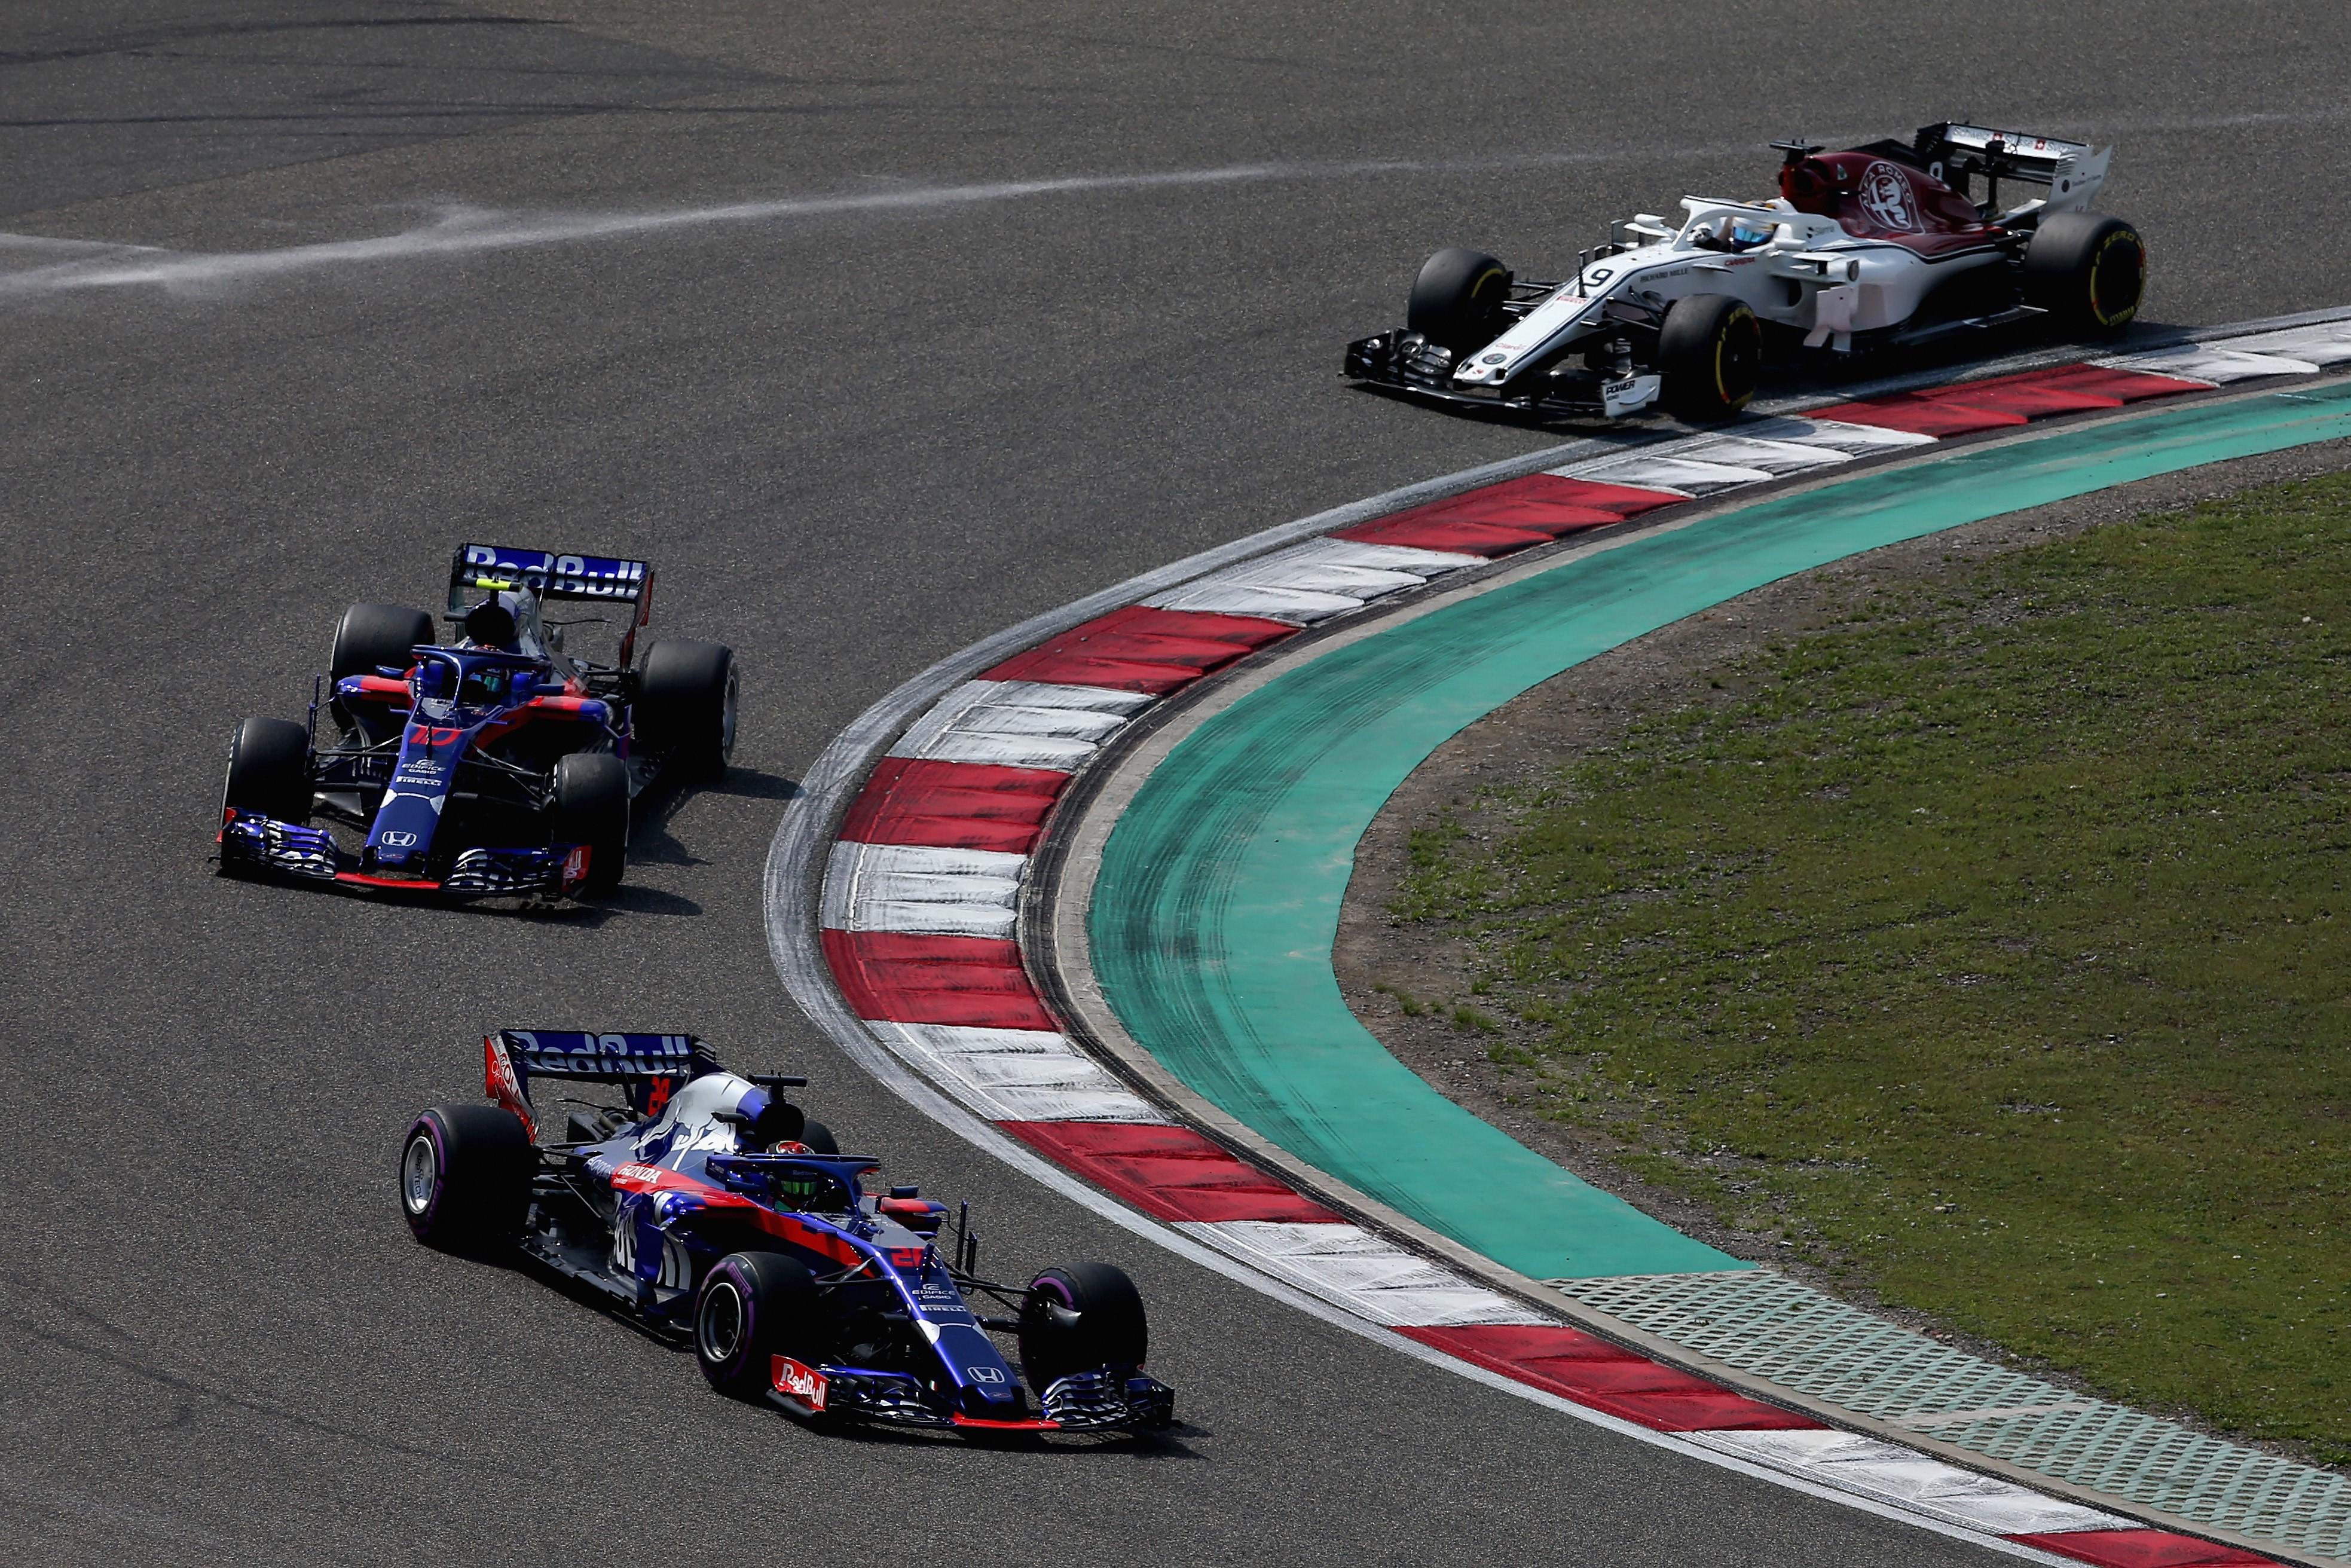 Pierre Gasly et Brendon Hartley (Toro Rosso) lors du GP de Chine